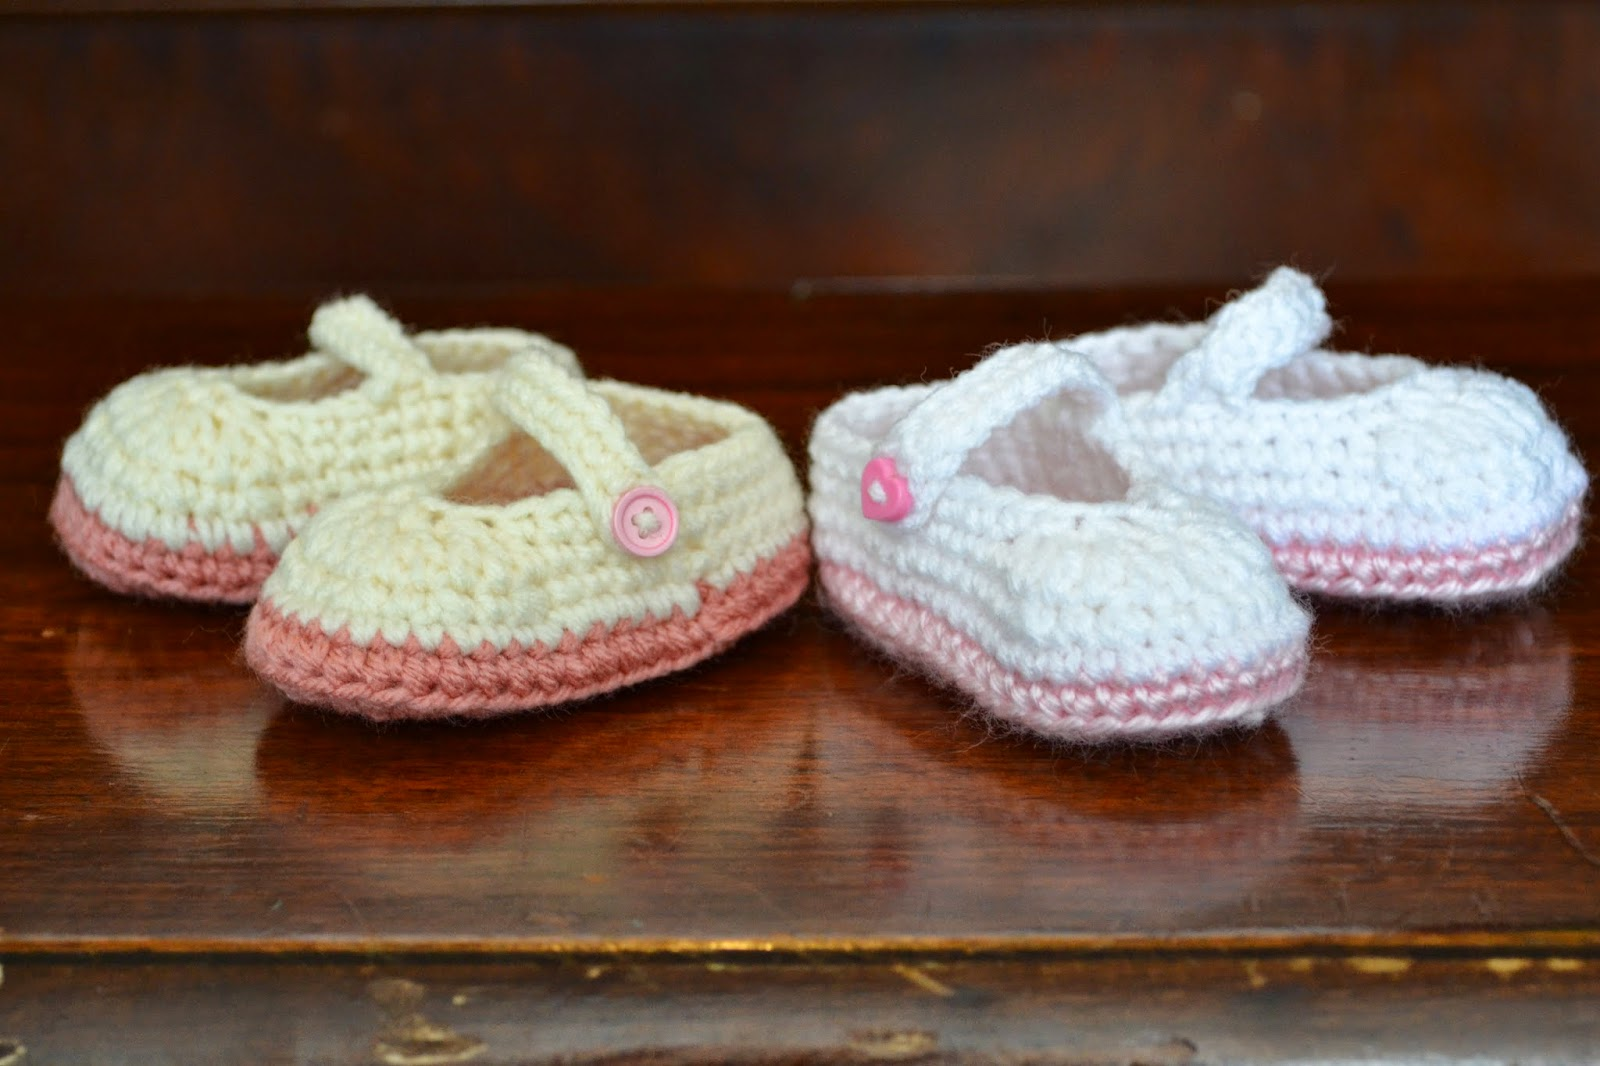 Knotty Knotty Crochet Pretty Plain Little Mary Jane Free Crochet